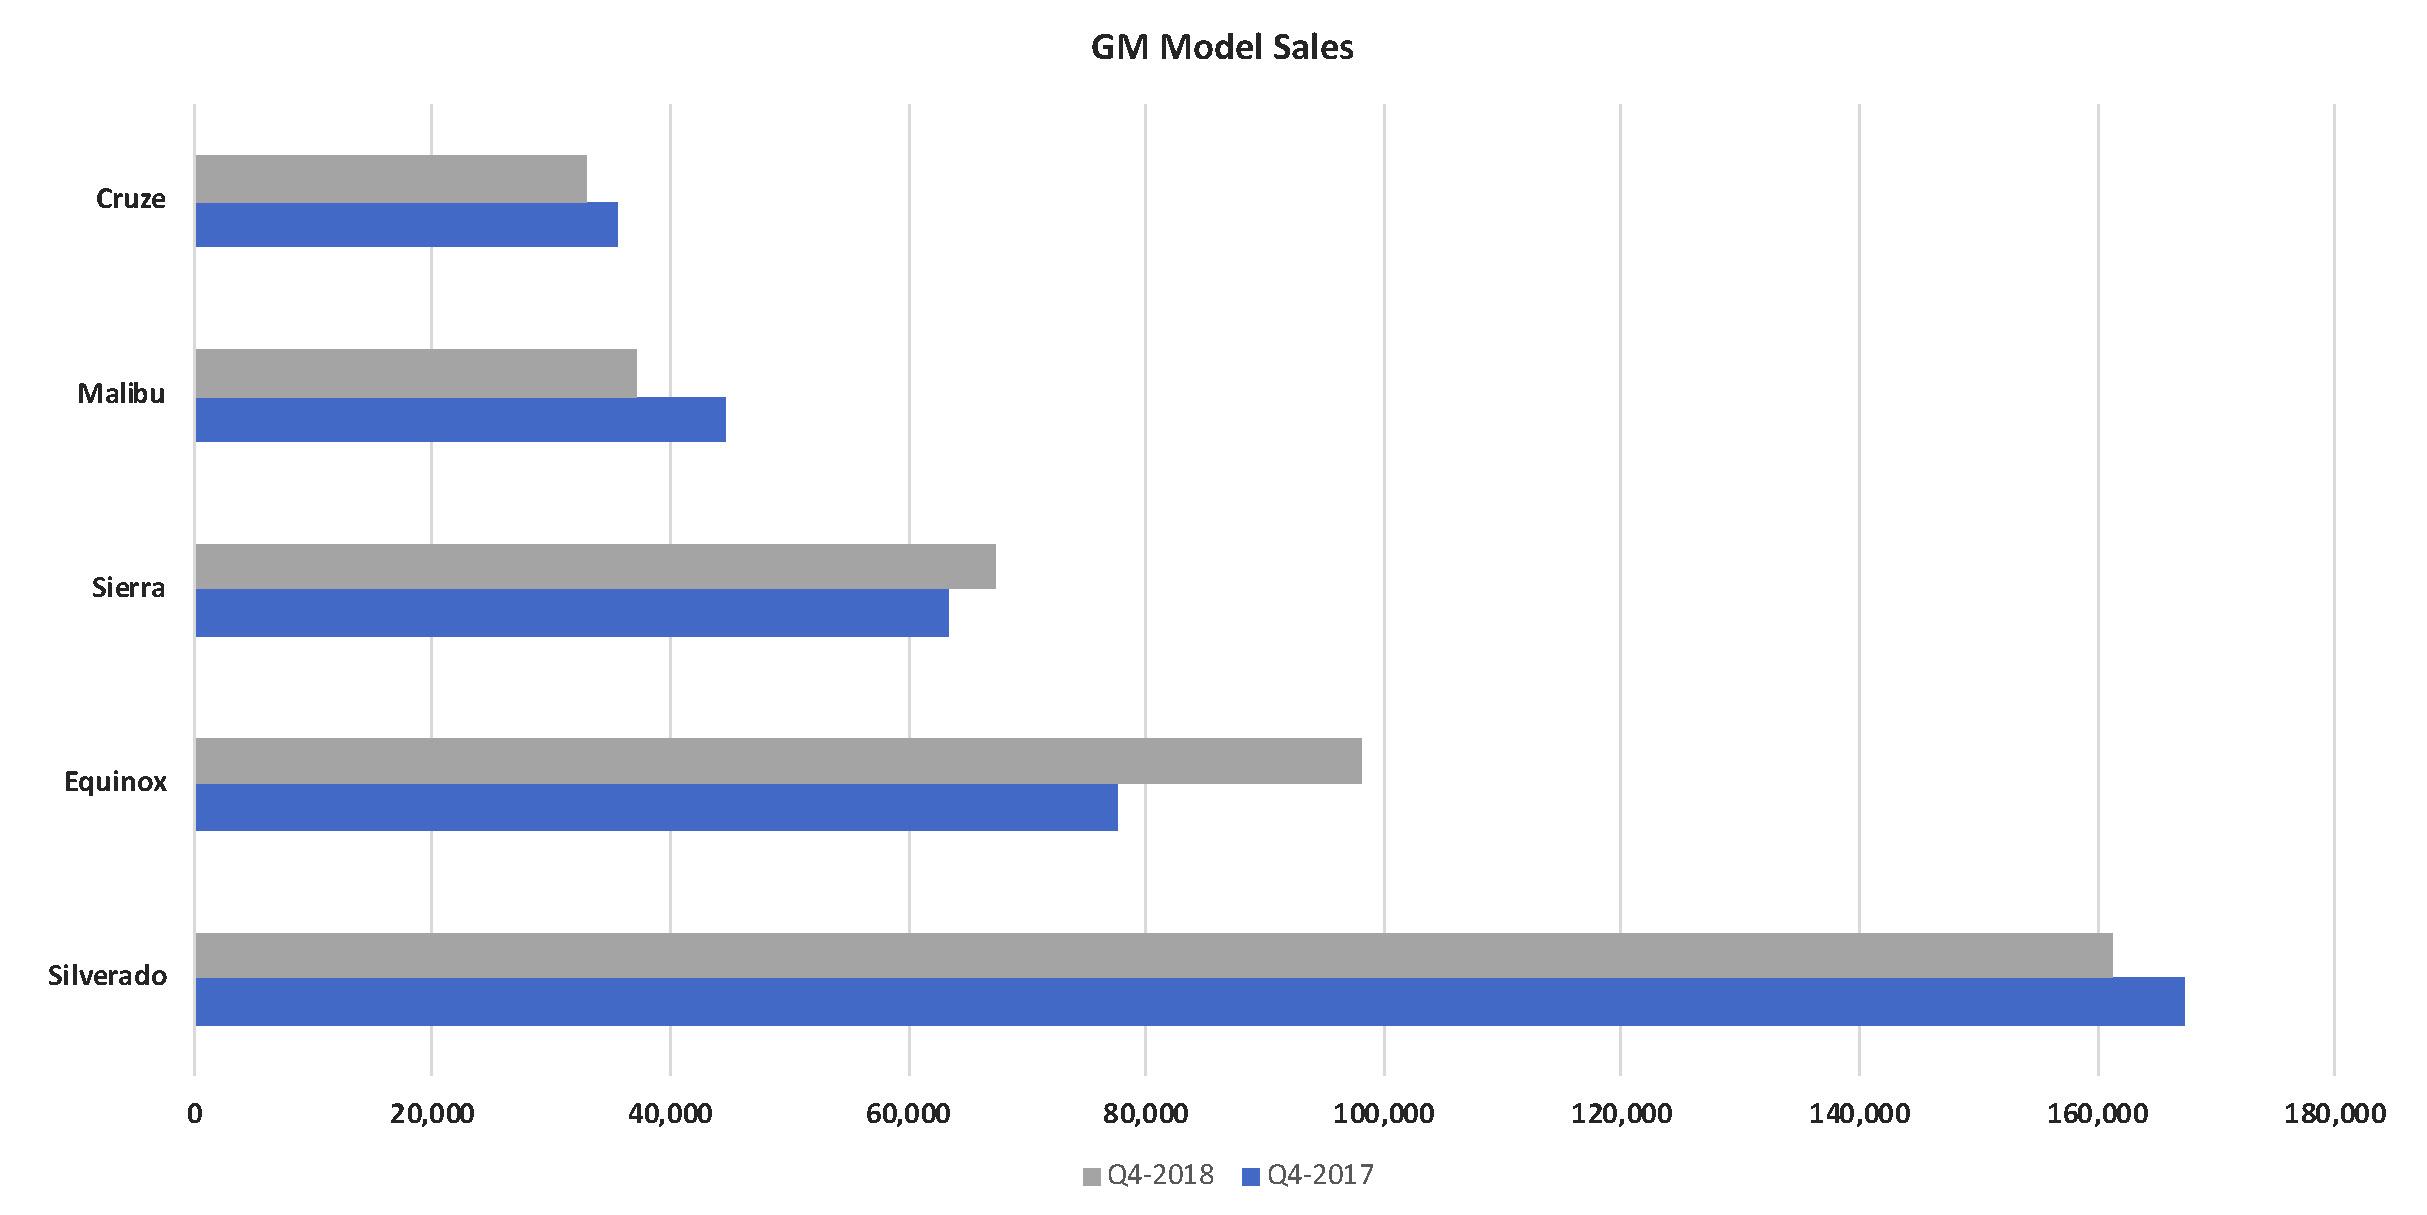 Gm model sales